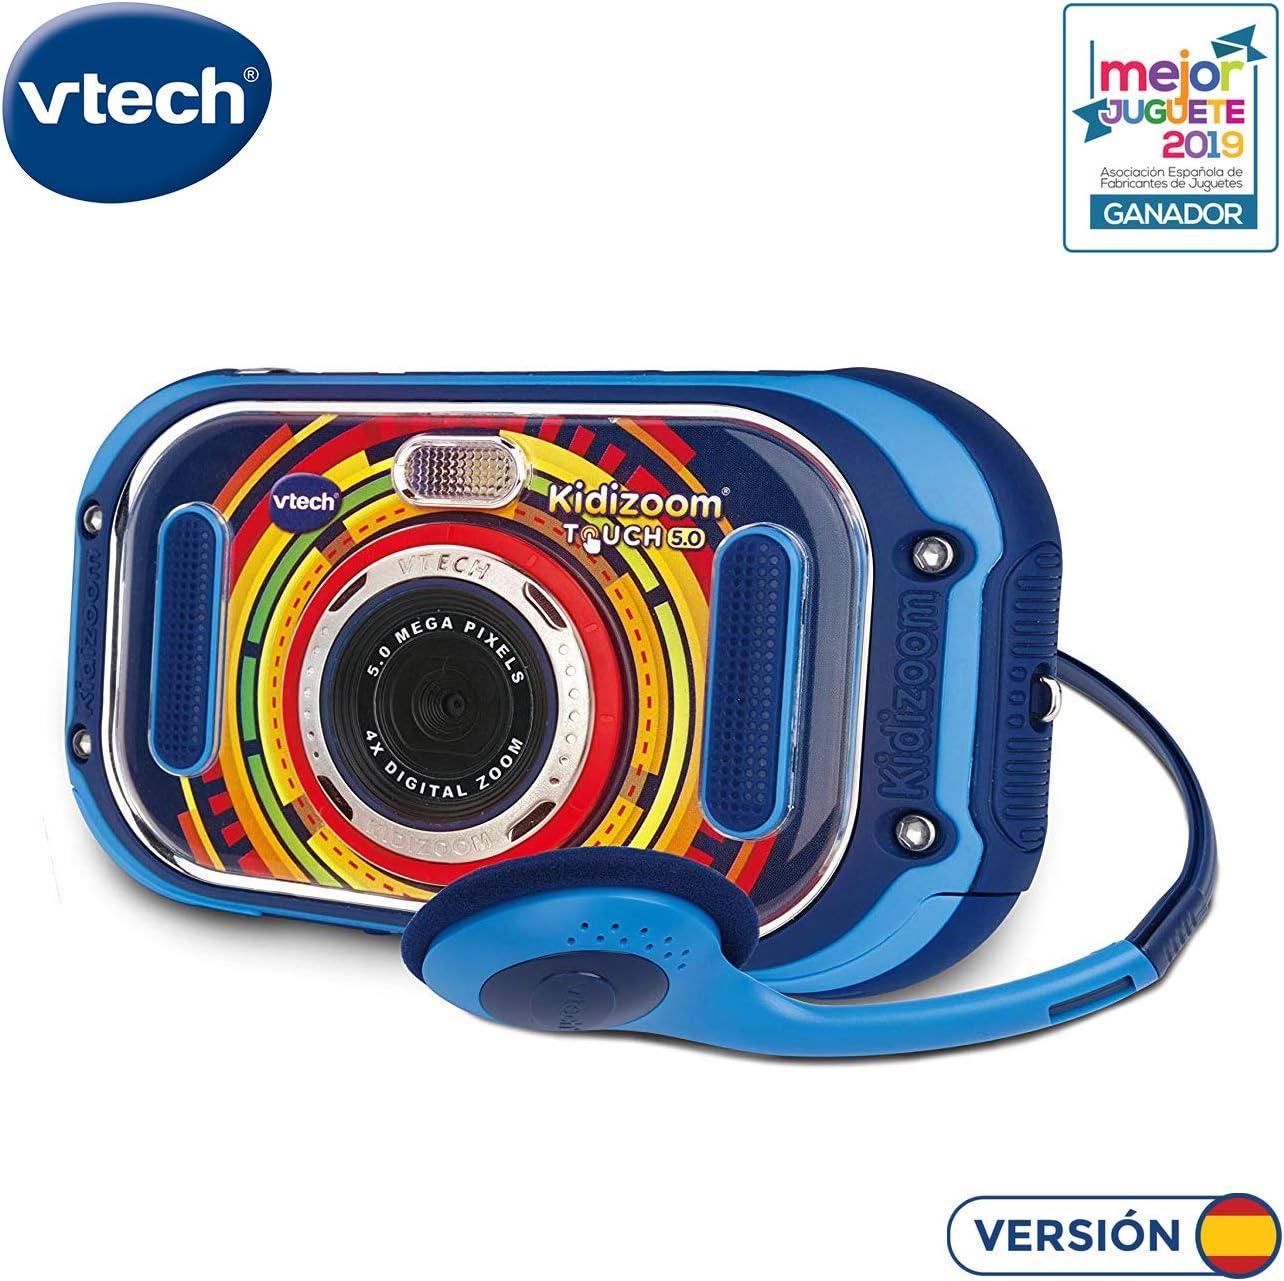 Amazon.es: VTech Kidizoom Touch 5.0 Cámara de fotos digital ...